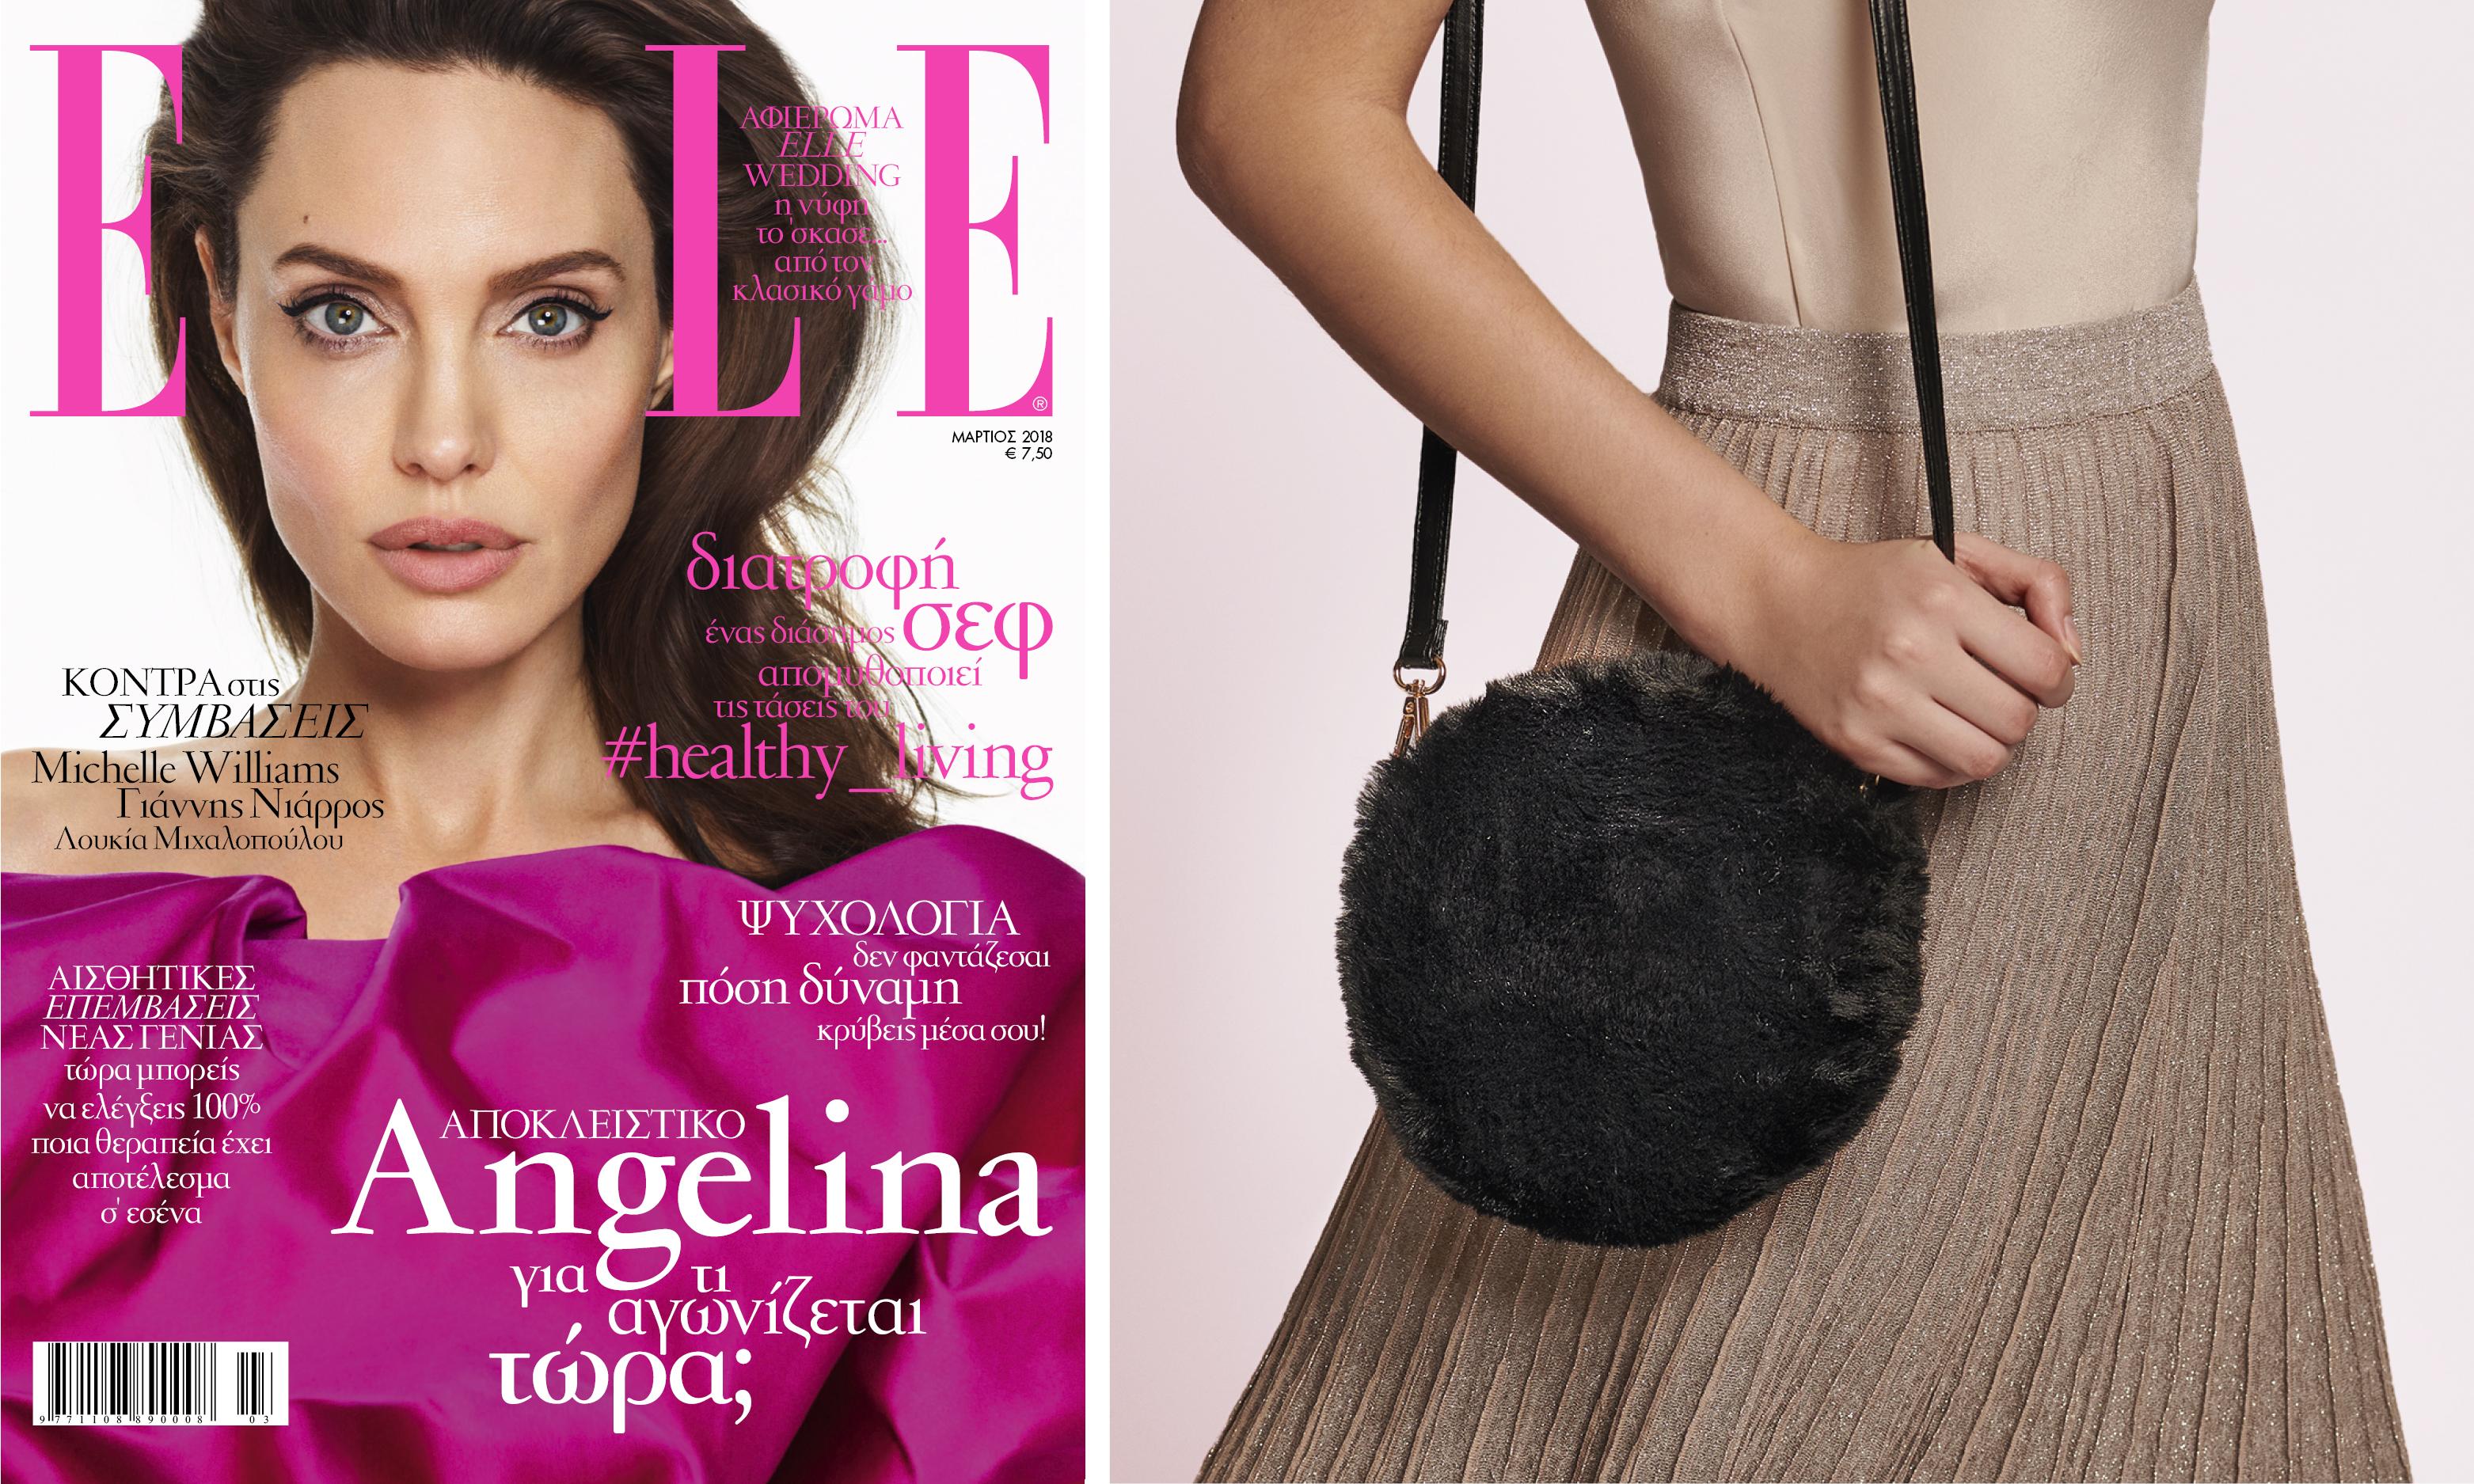 To τεύχος Μαρτίου του ELLE με εξώφυλλο την Angelina Jolie κυκλοφορεί στα  περίπτερα fbb5b1bda59